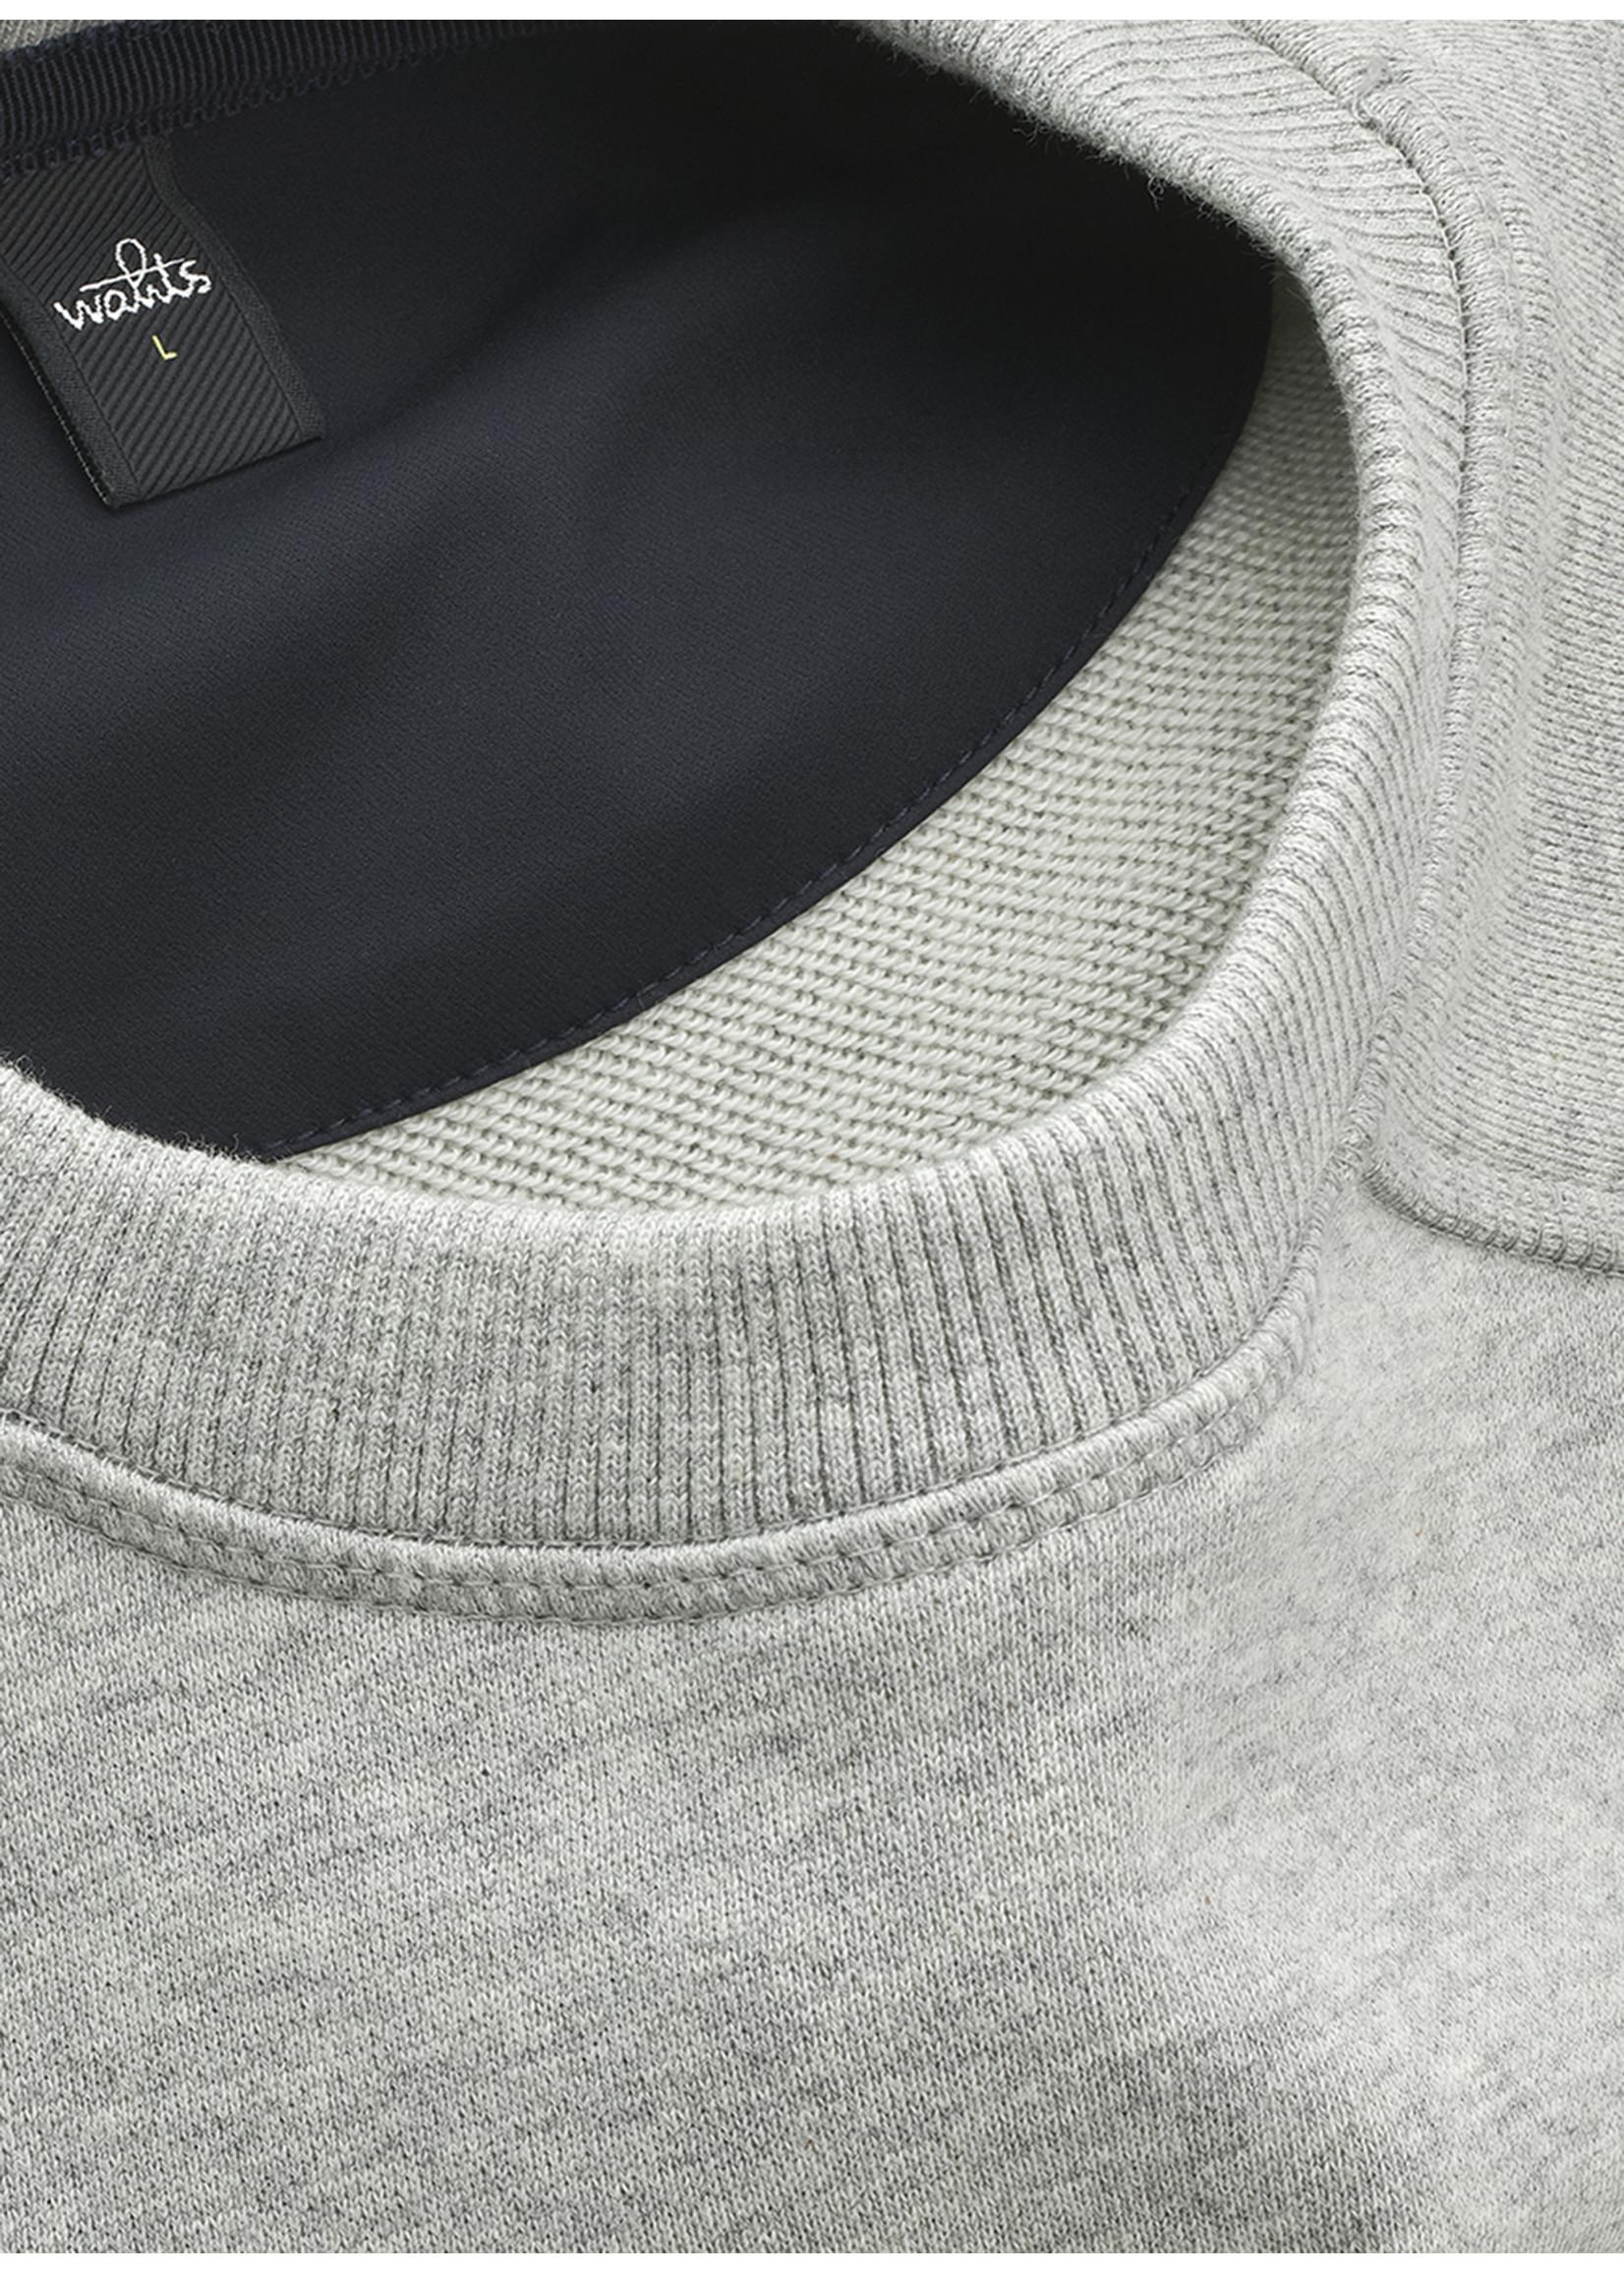 Wahts Moore crewneck sweater light grey